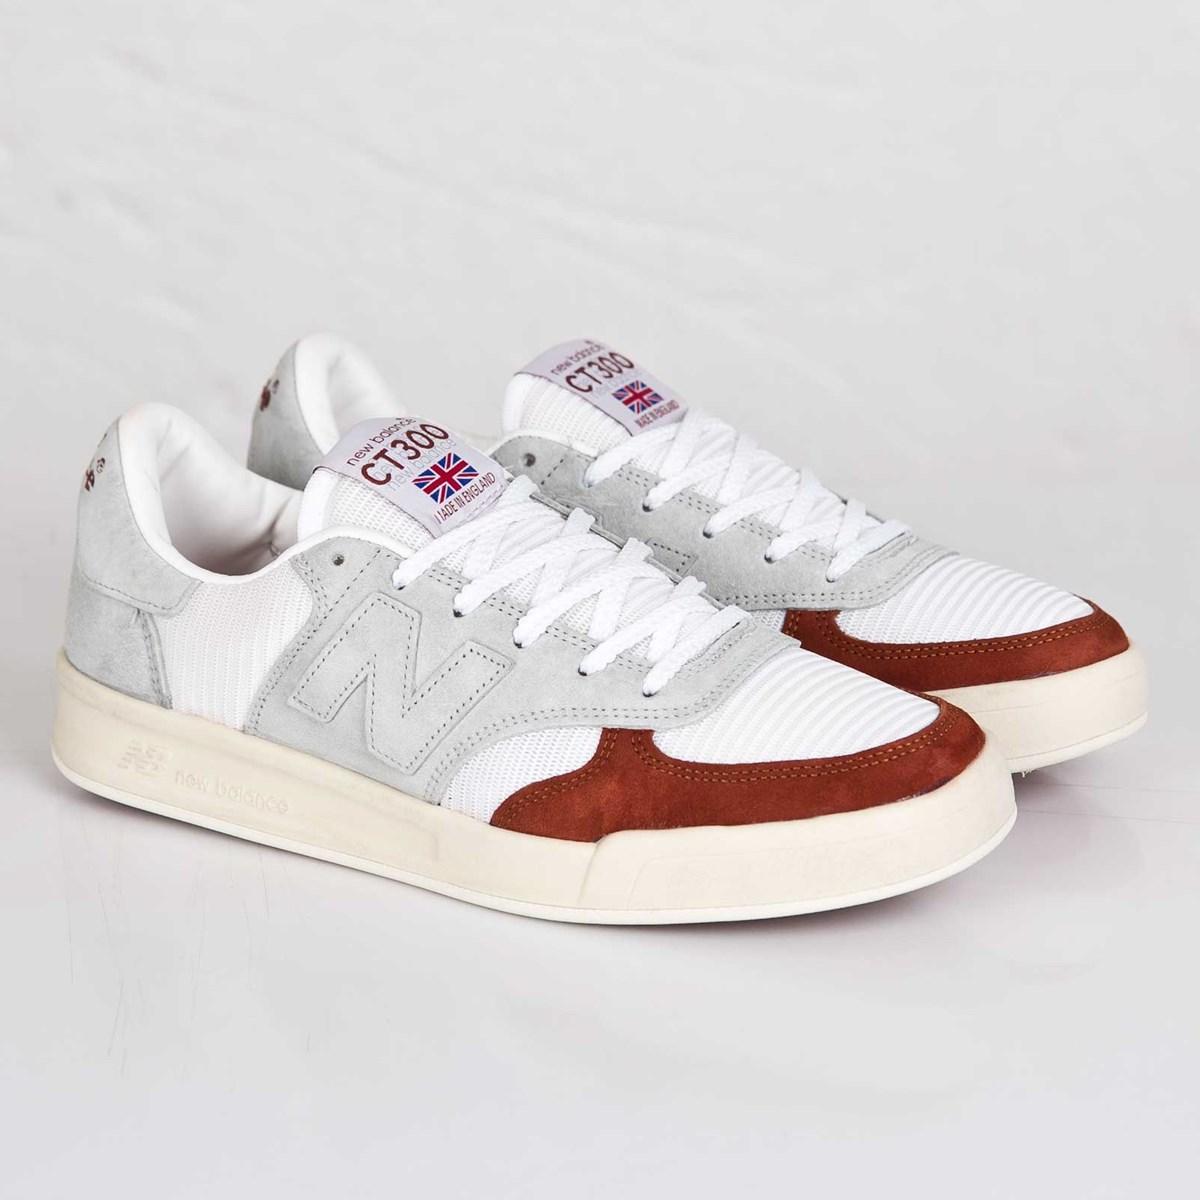 New Balance CT300 - Ct300psn - SNS | sneakers & streetwear online since 1999